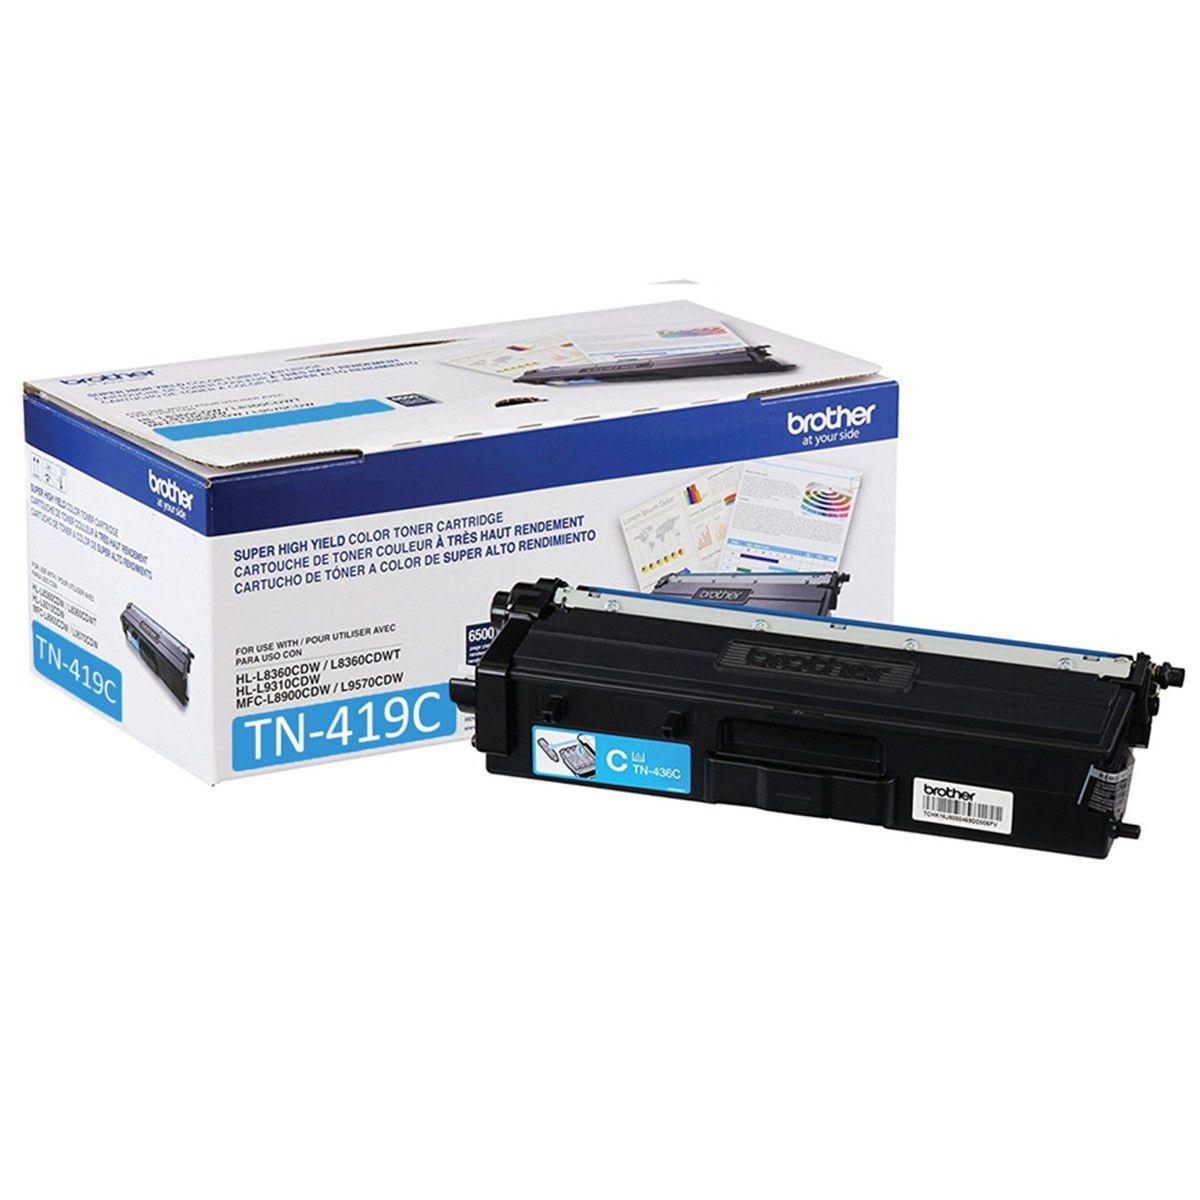 Toner Original Brother Tn419C Tn-419C Ciano Tn419 L8360 L8610 L8900 L9570 9k